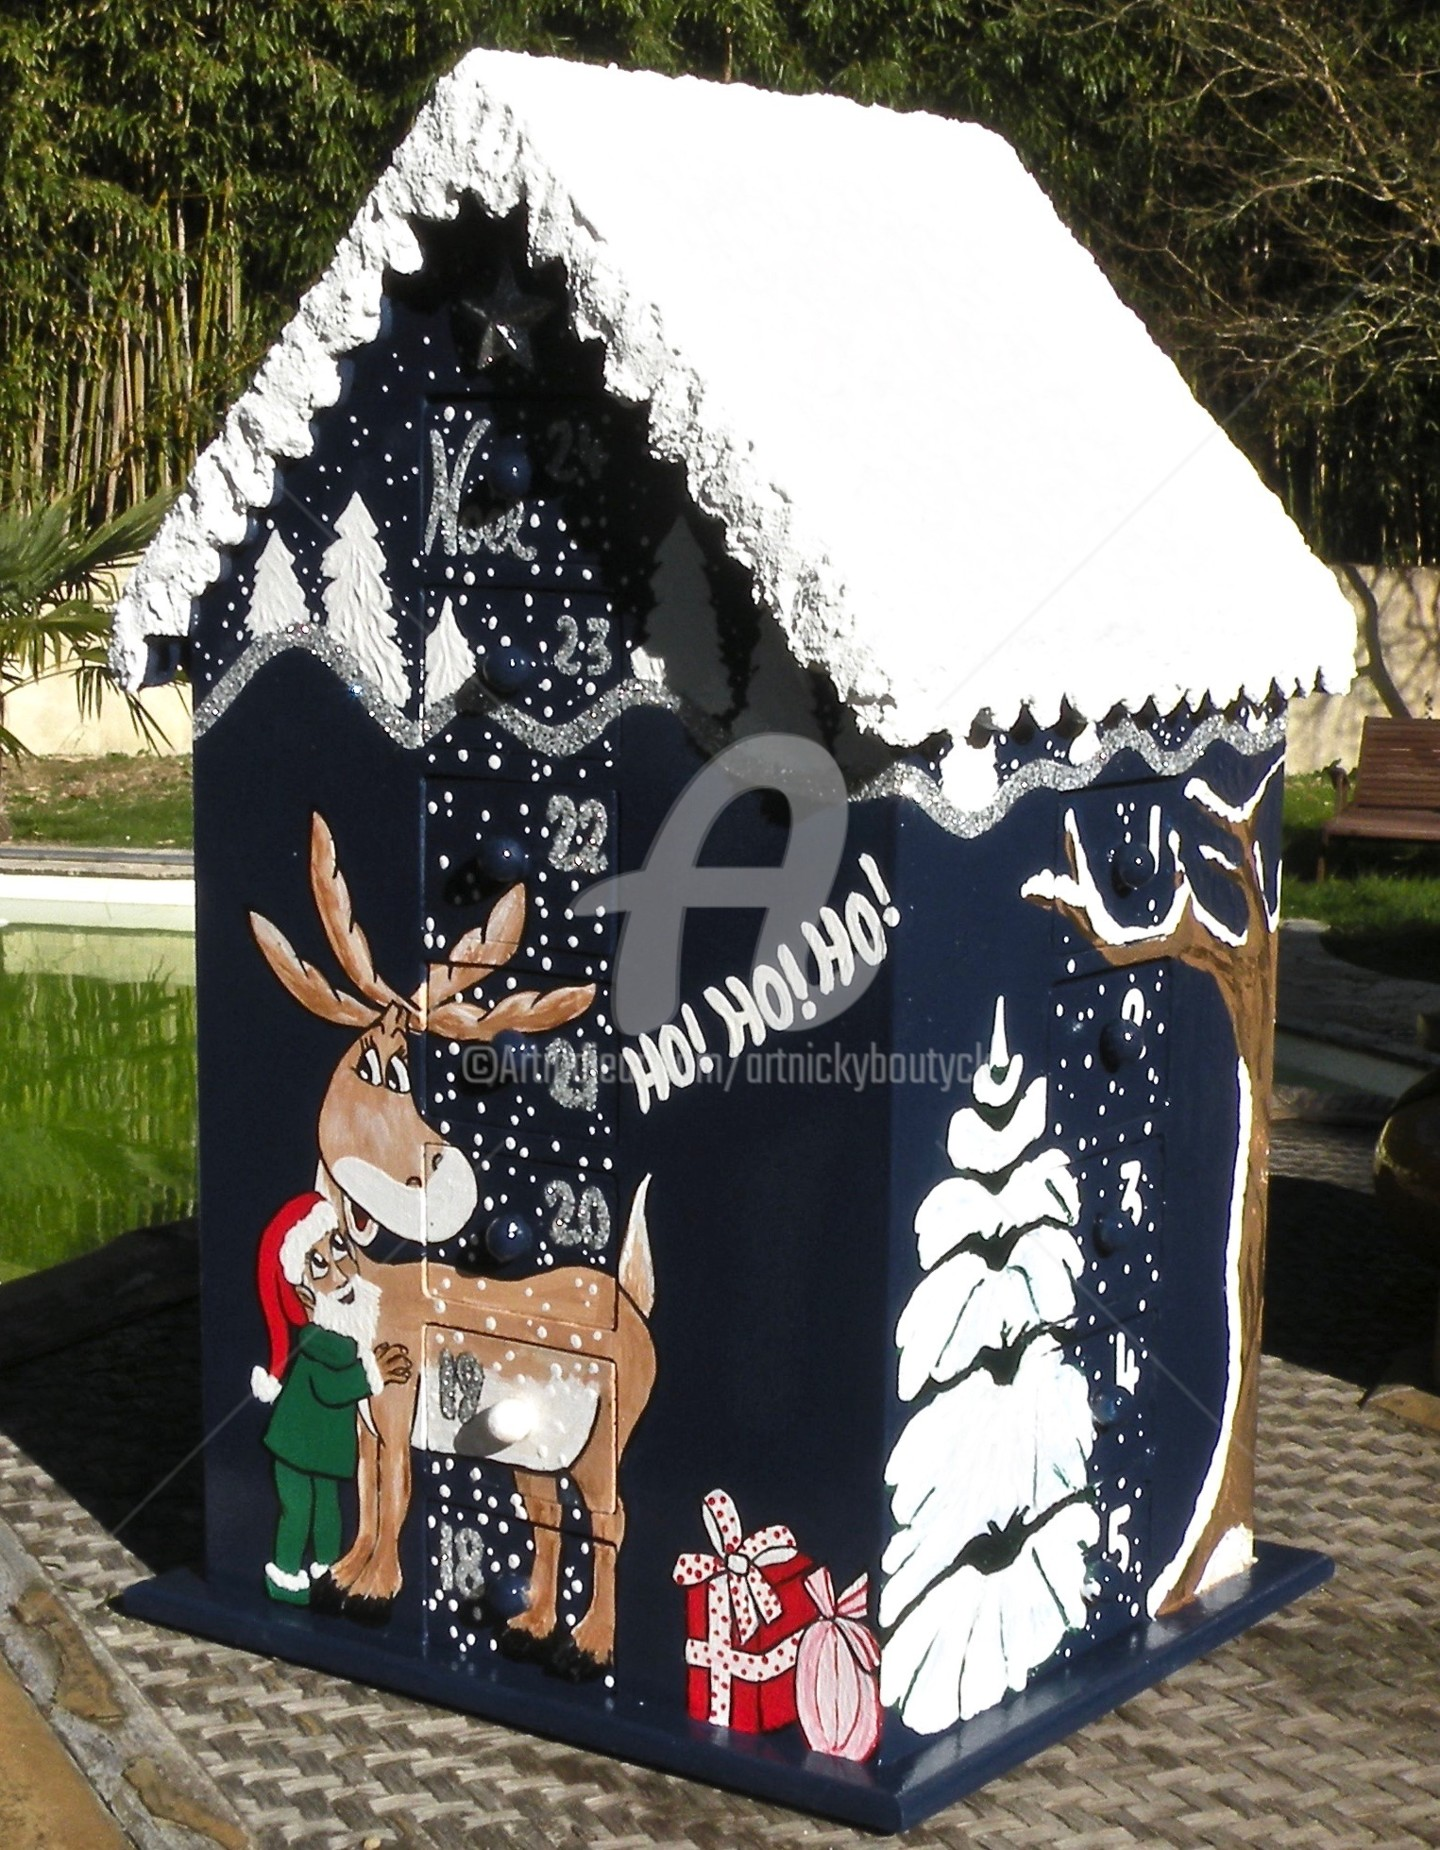 Art-Nicky - Christmas Calendrier de l'Avent bois (105)